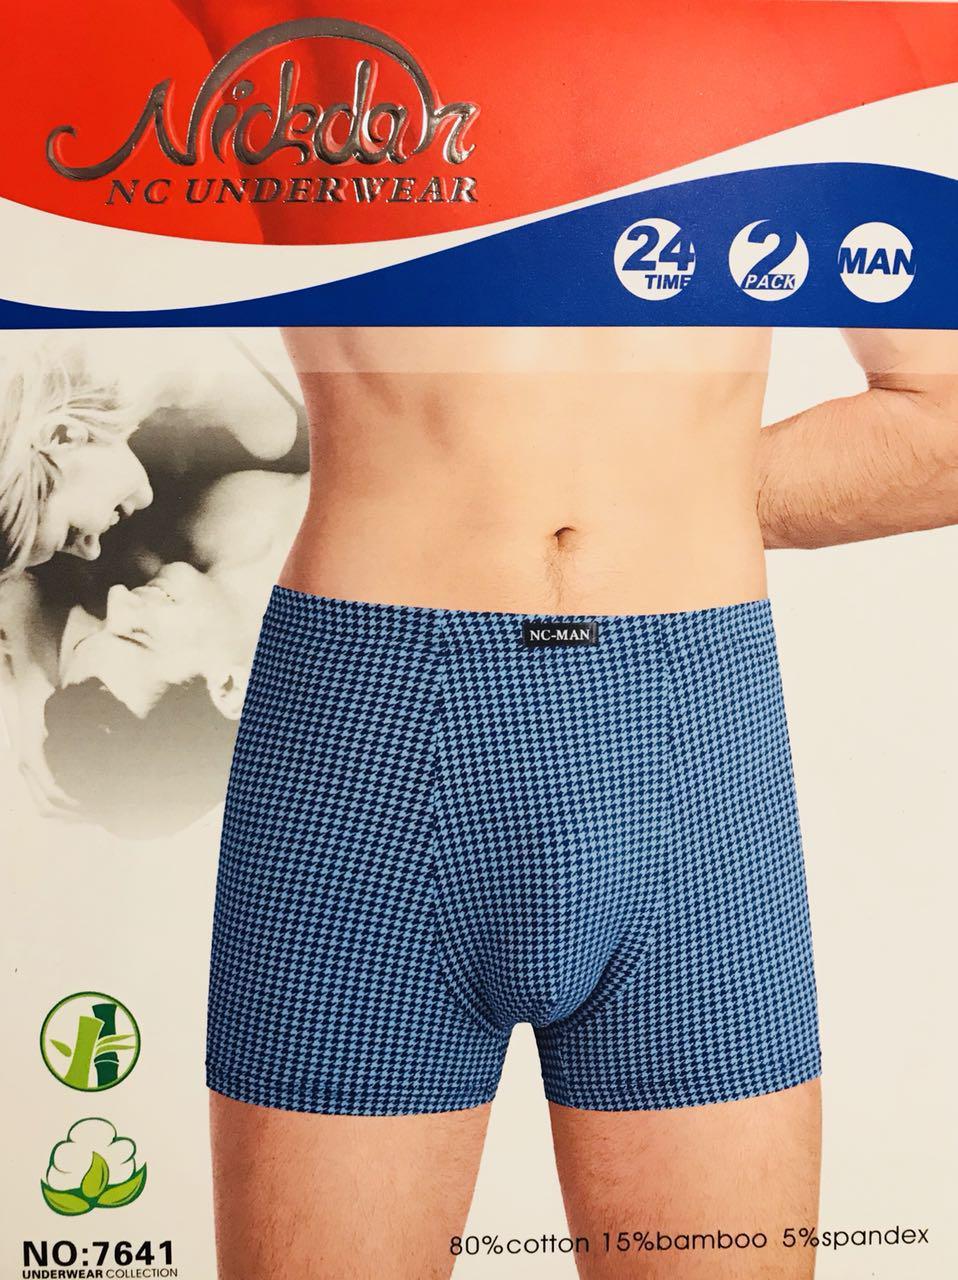 Трусы мужские боксёры хлопок + бамбук Nickdan размер L-3XL(46-56) 7641